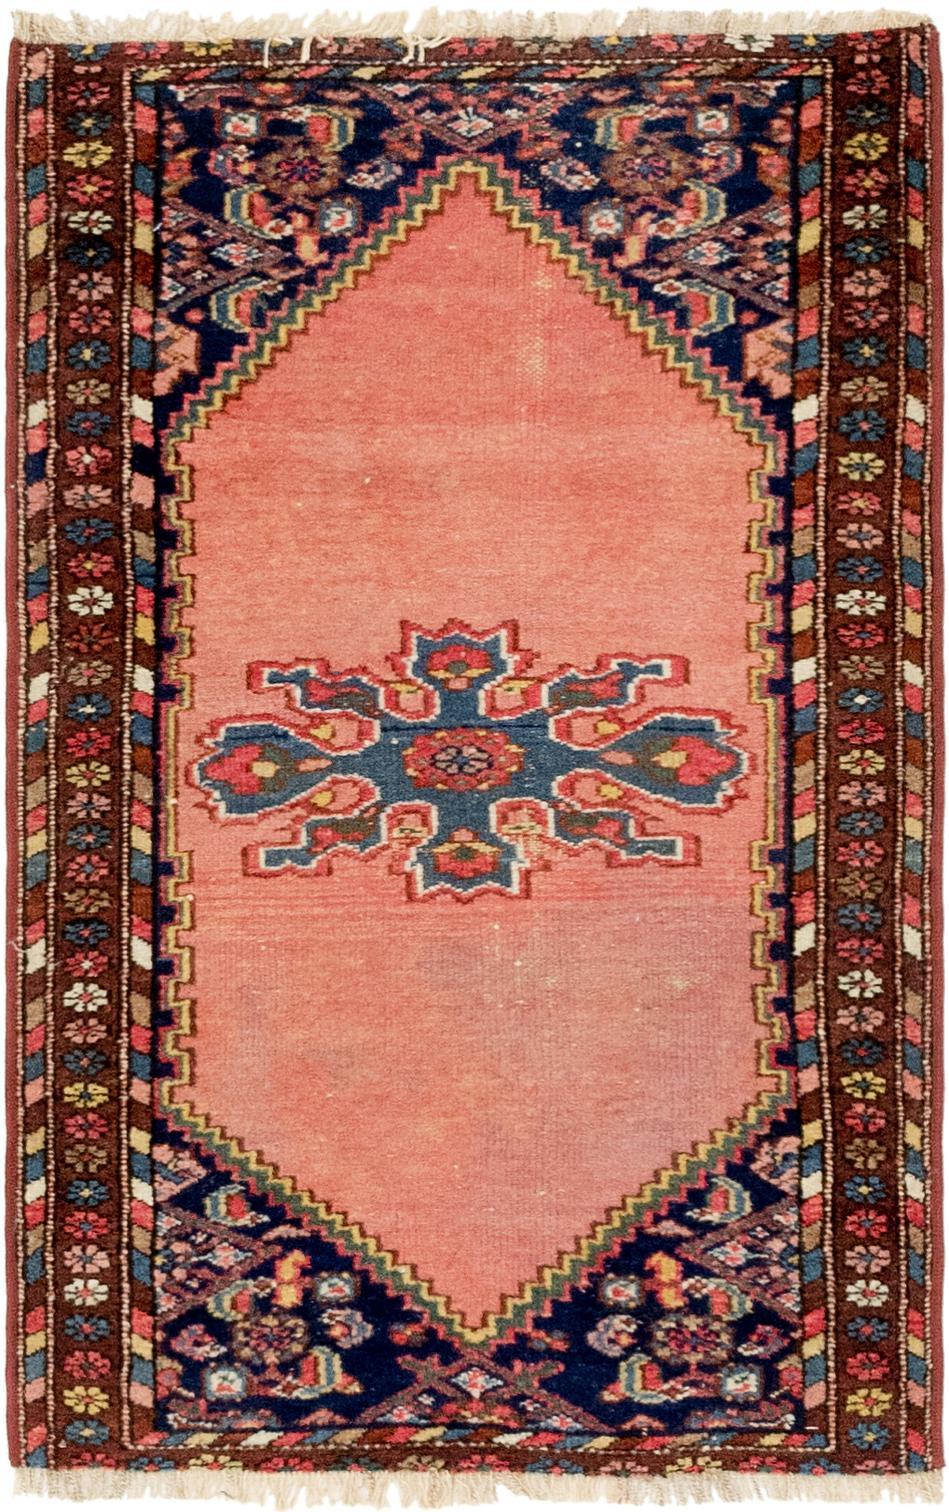 Pink 2 4 X 3 10 Hamedan Persian Rug Persian Rugs Handknotted Com